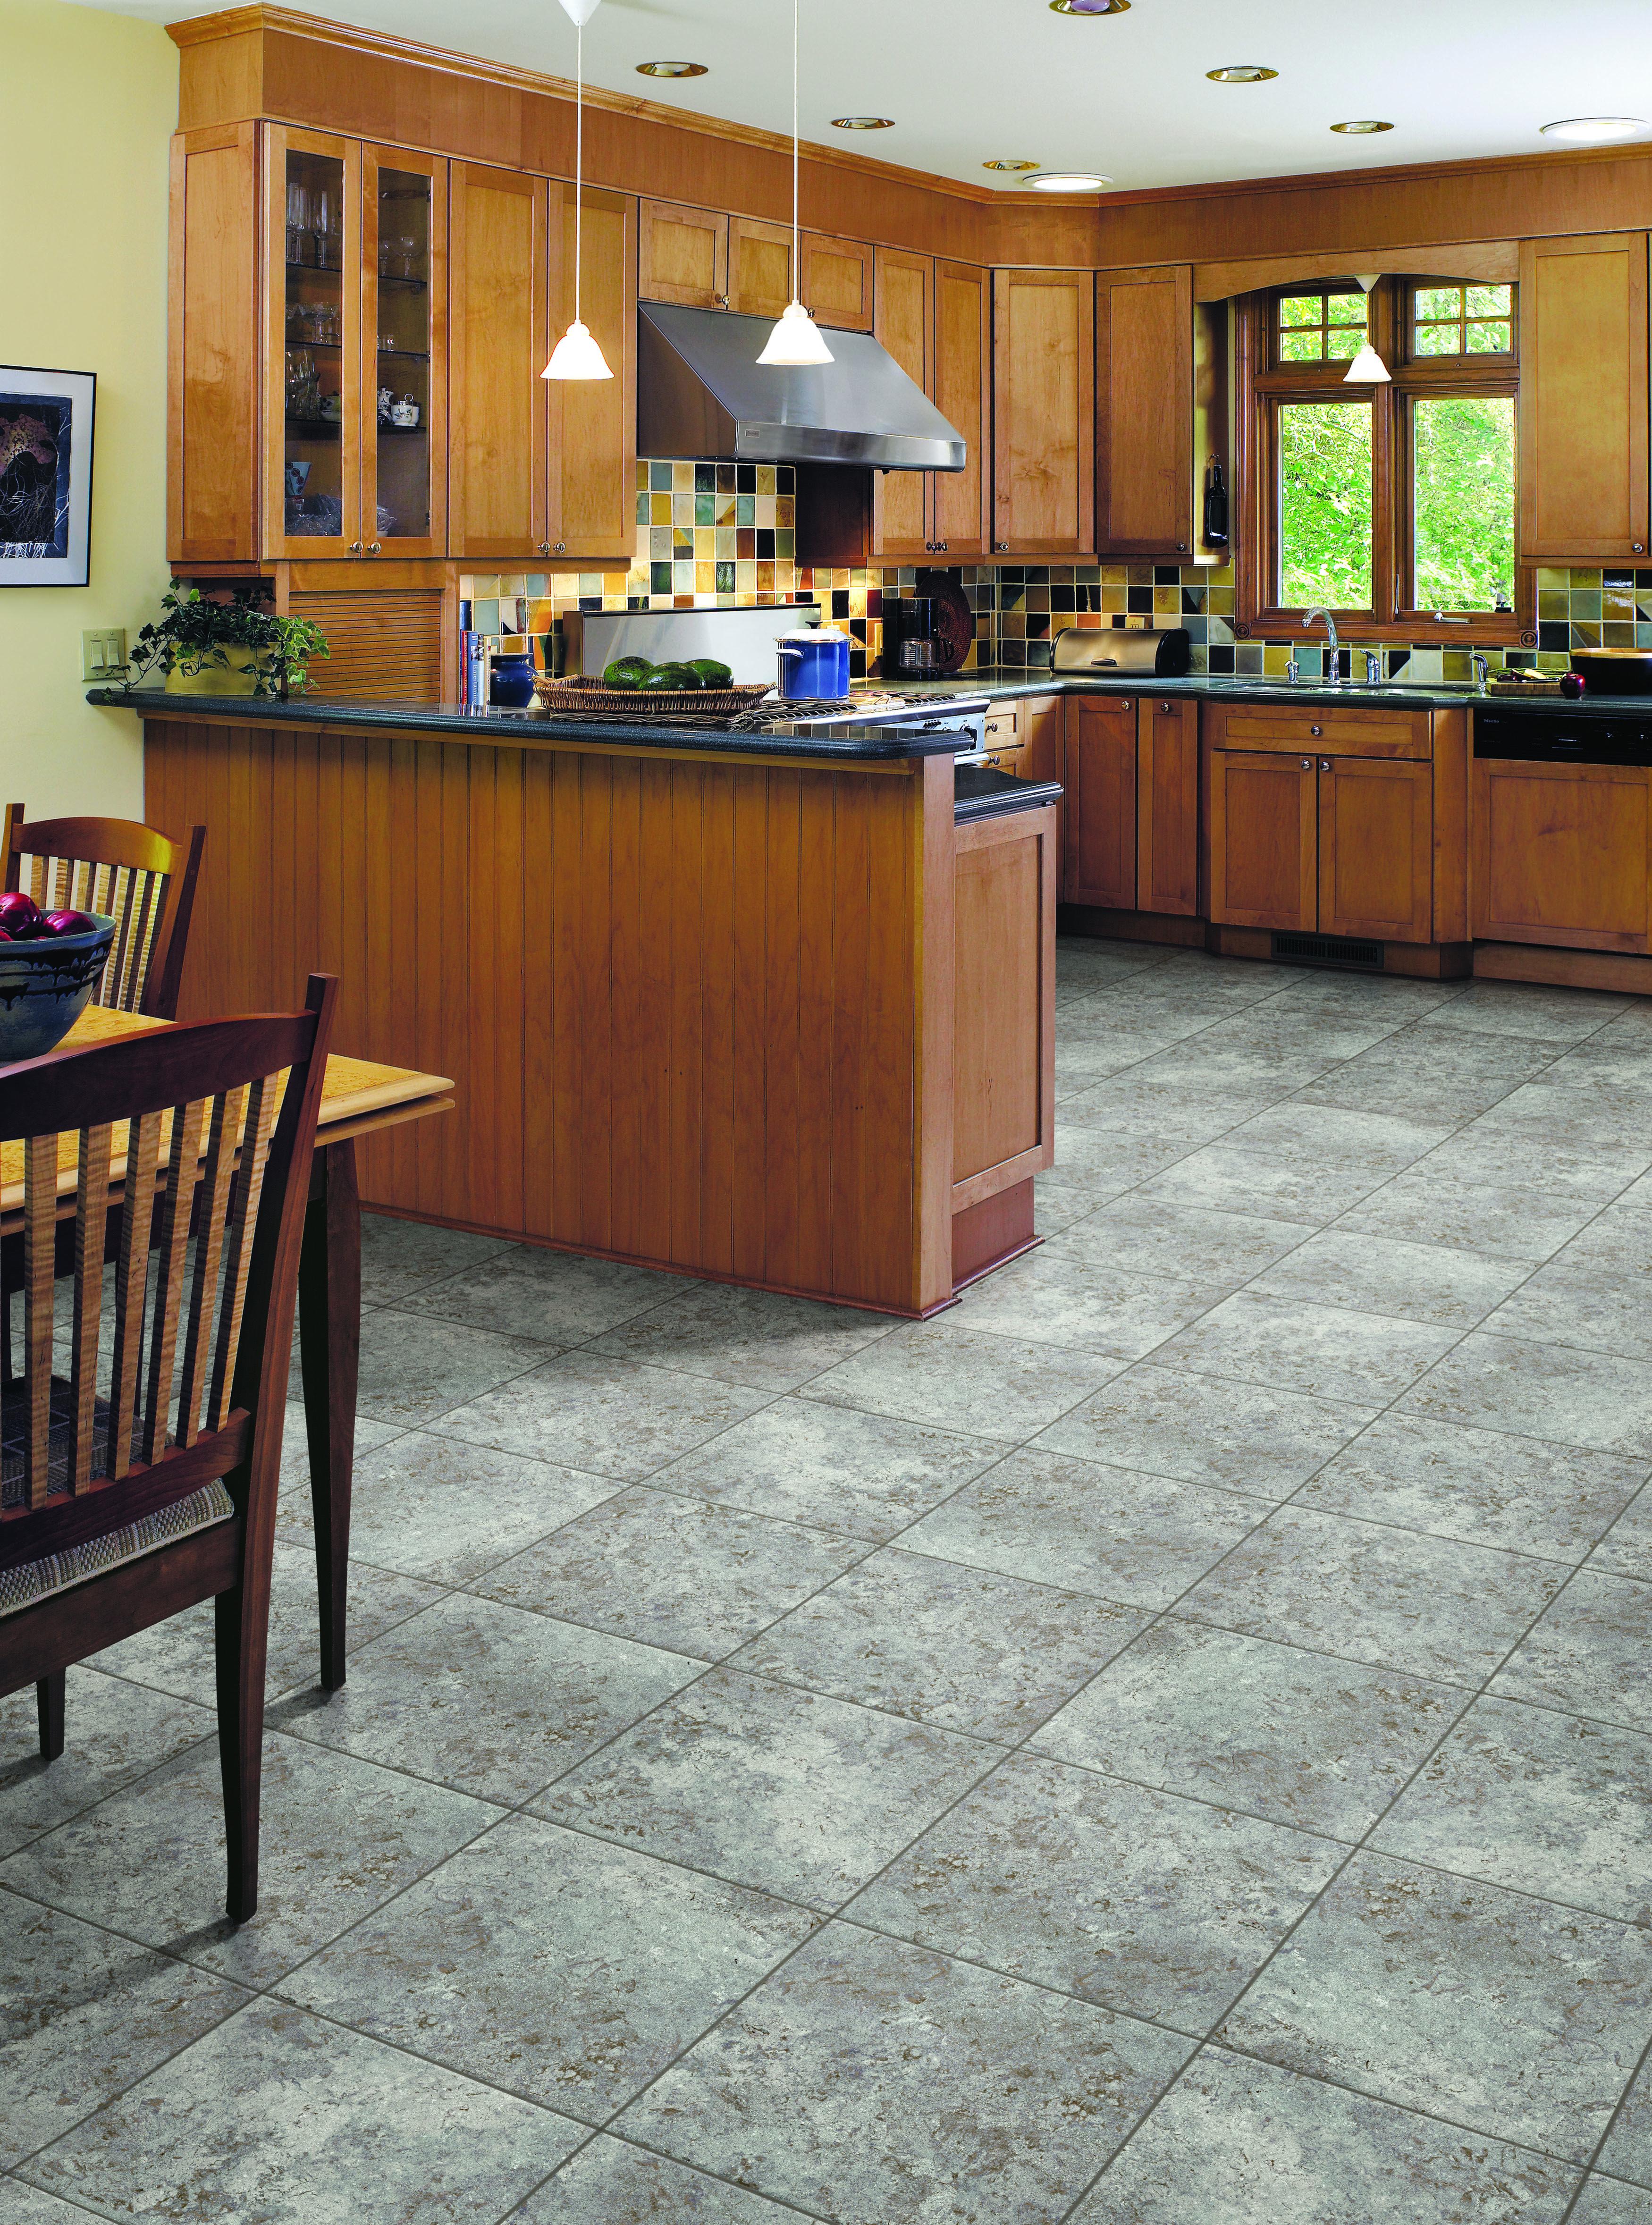 renaissance in moonstone by congoleum luxury vinyl tile house flooring kitchen decor on kitchen remodel vinyl flooring id=96248